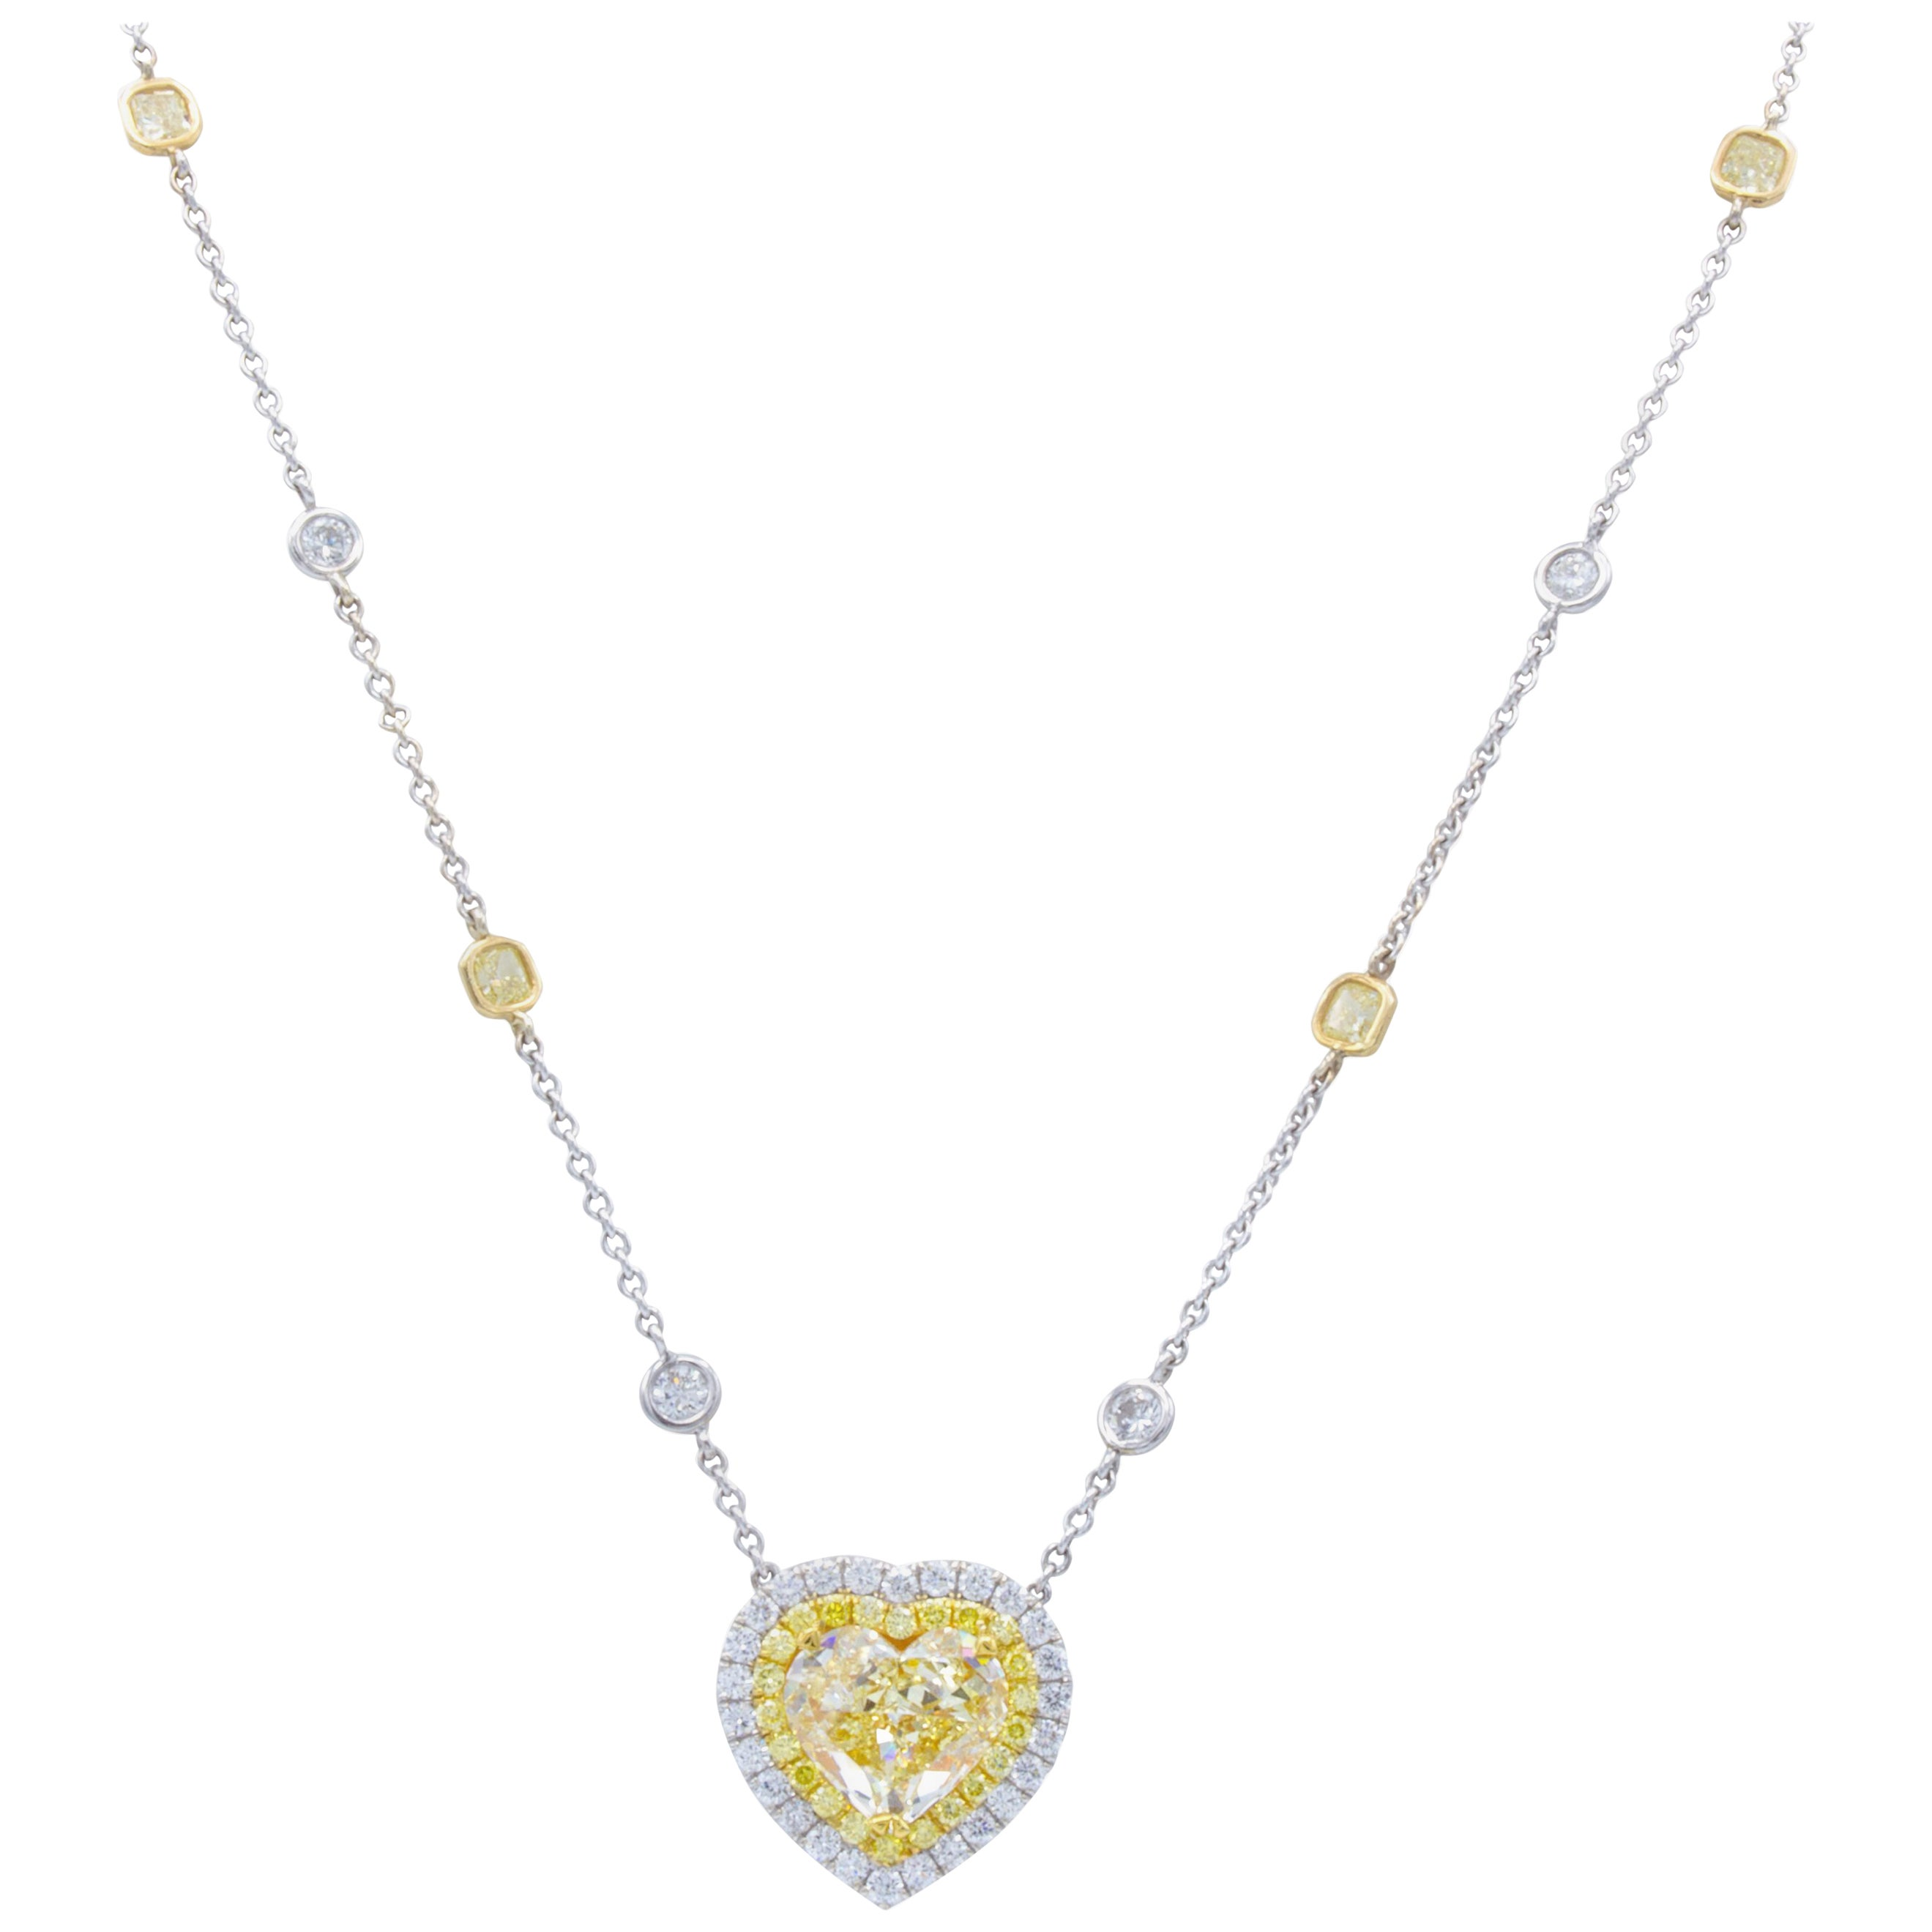 David Rosenberg 3.97 Carat GIA Fancy Light Yellow Heart Shape Diamond Necklace